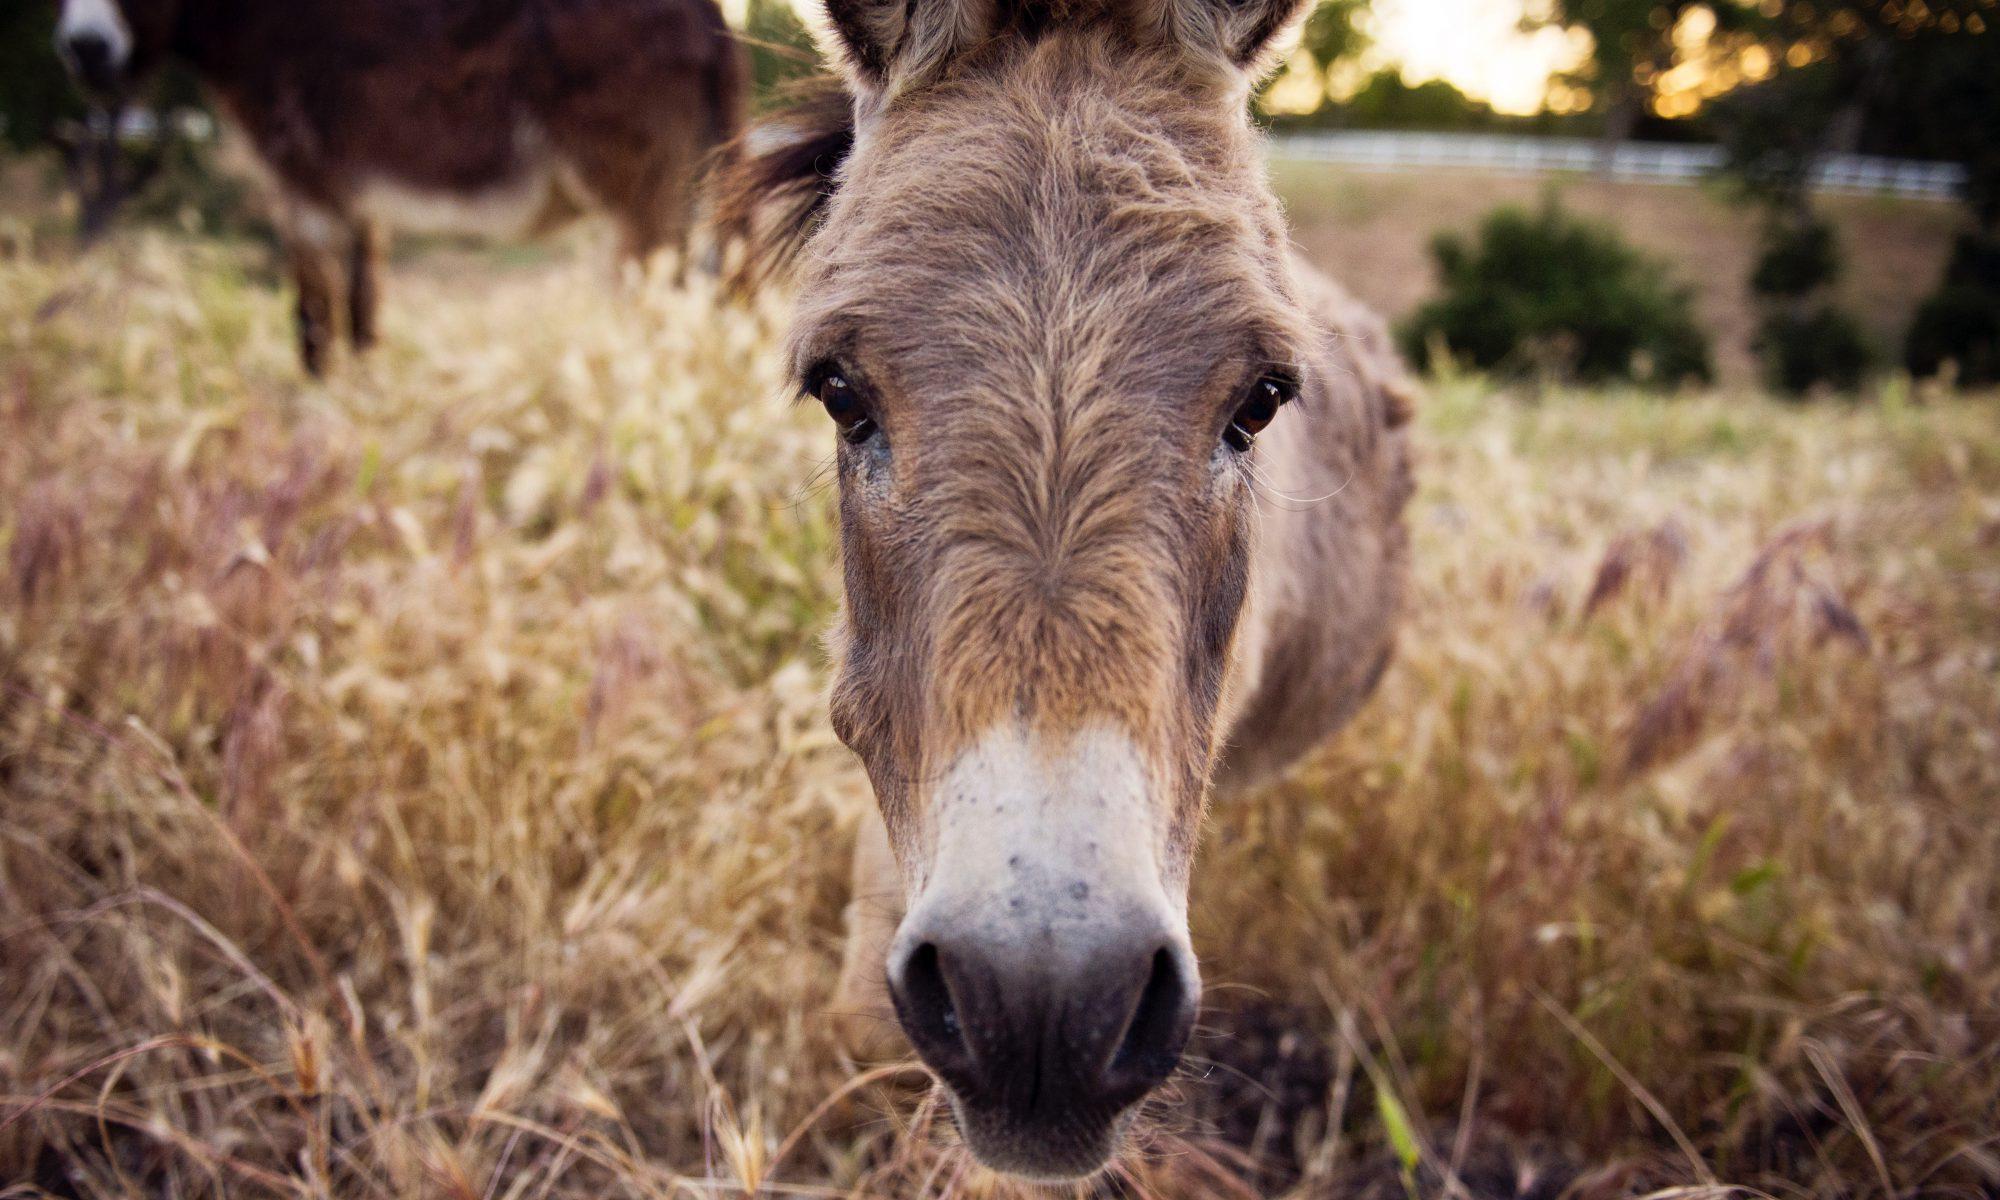 tisno croatia donkey